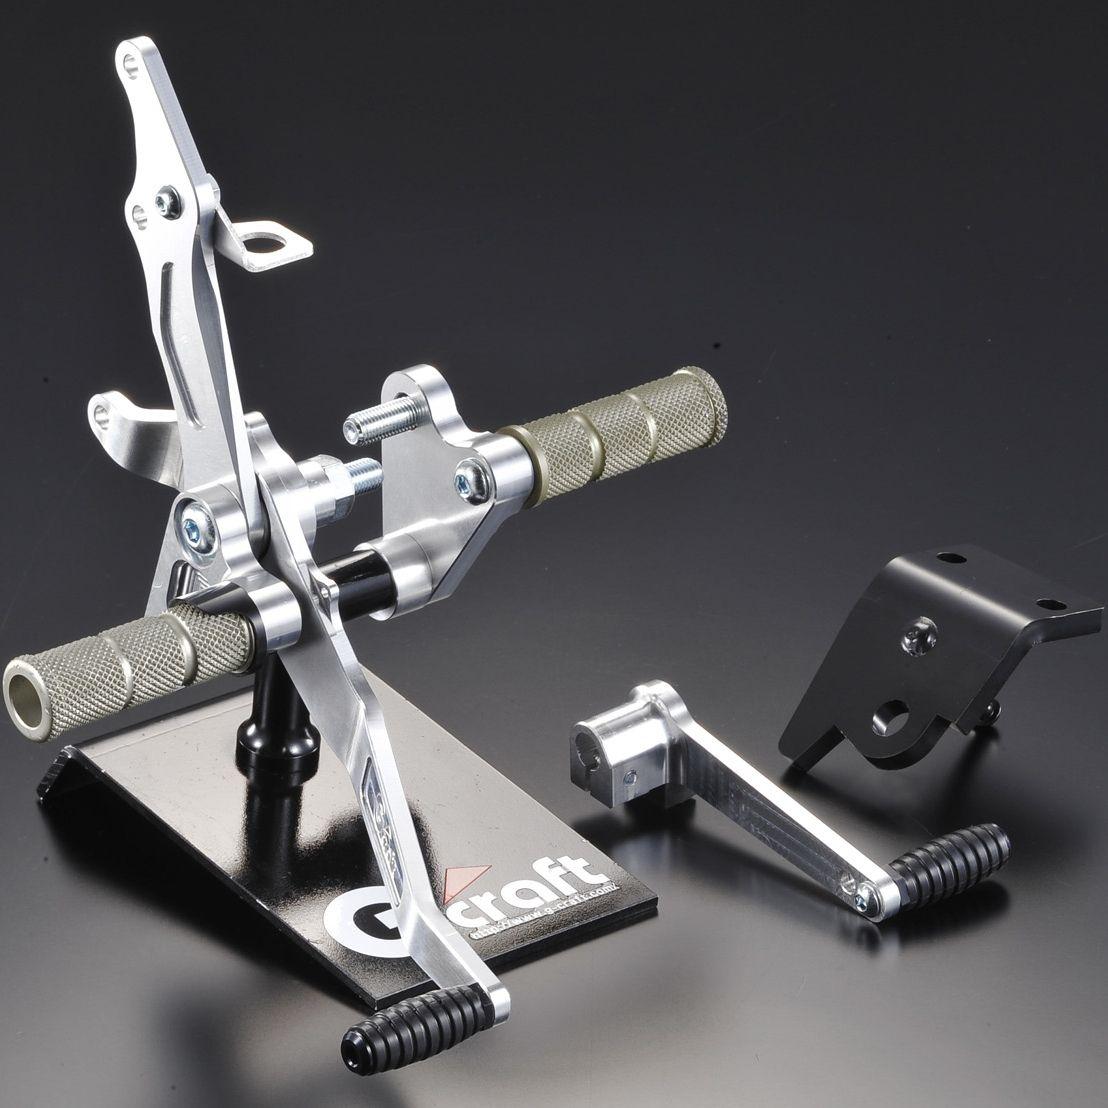 【G-Craft】腳踏後移套件 碟式煞車專用 - 「Webike-摩托百貨」